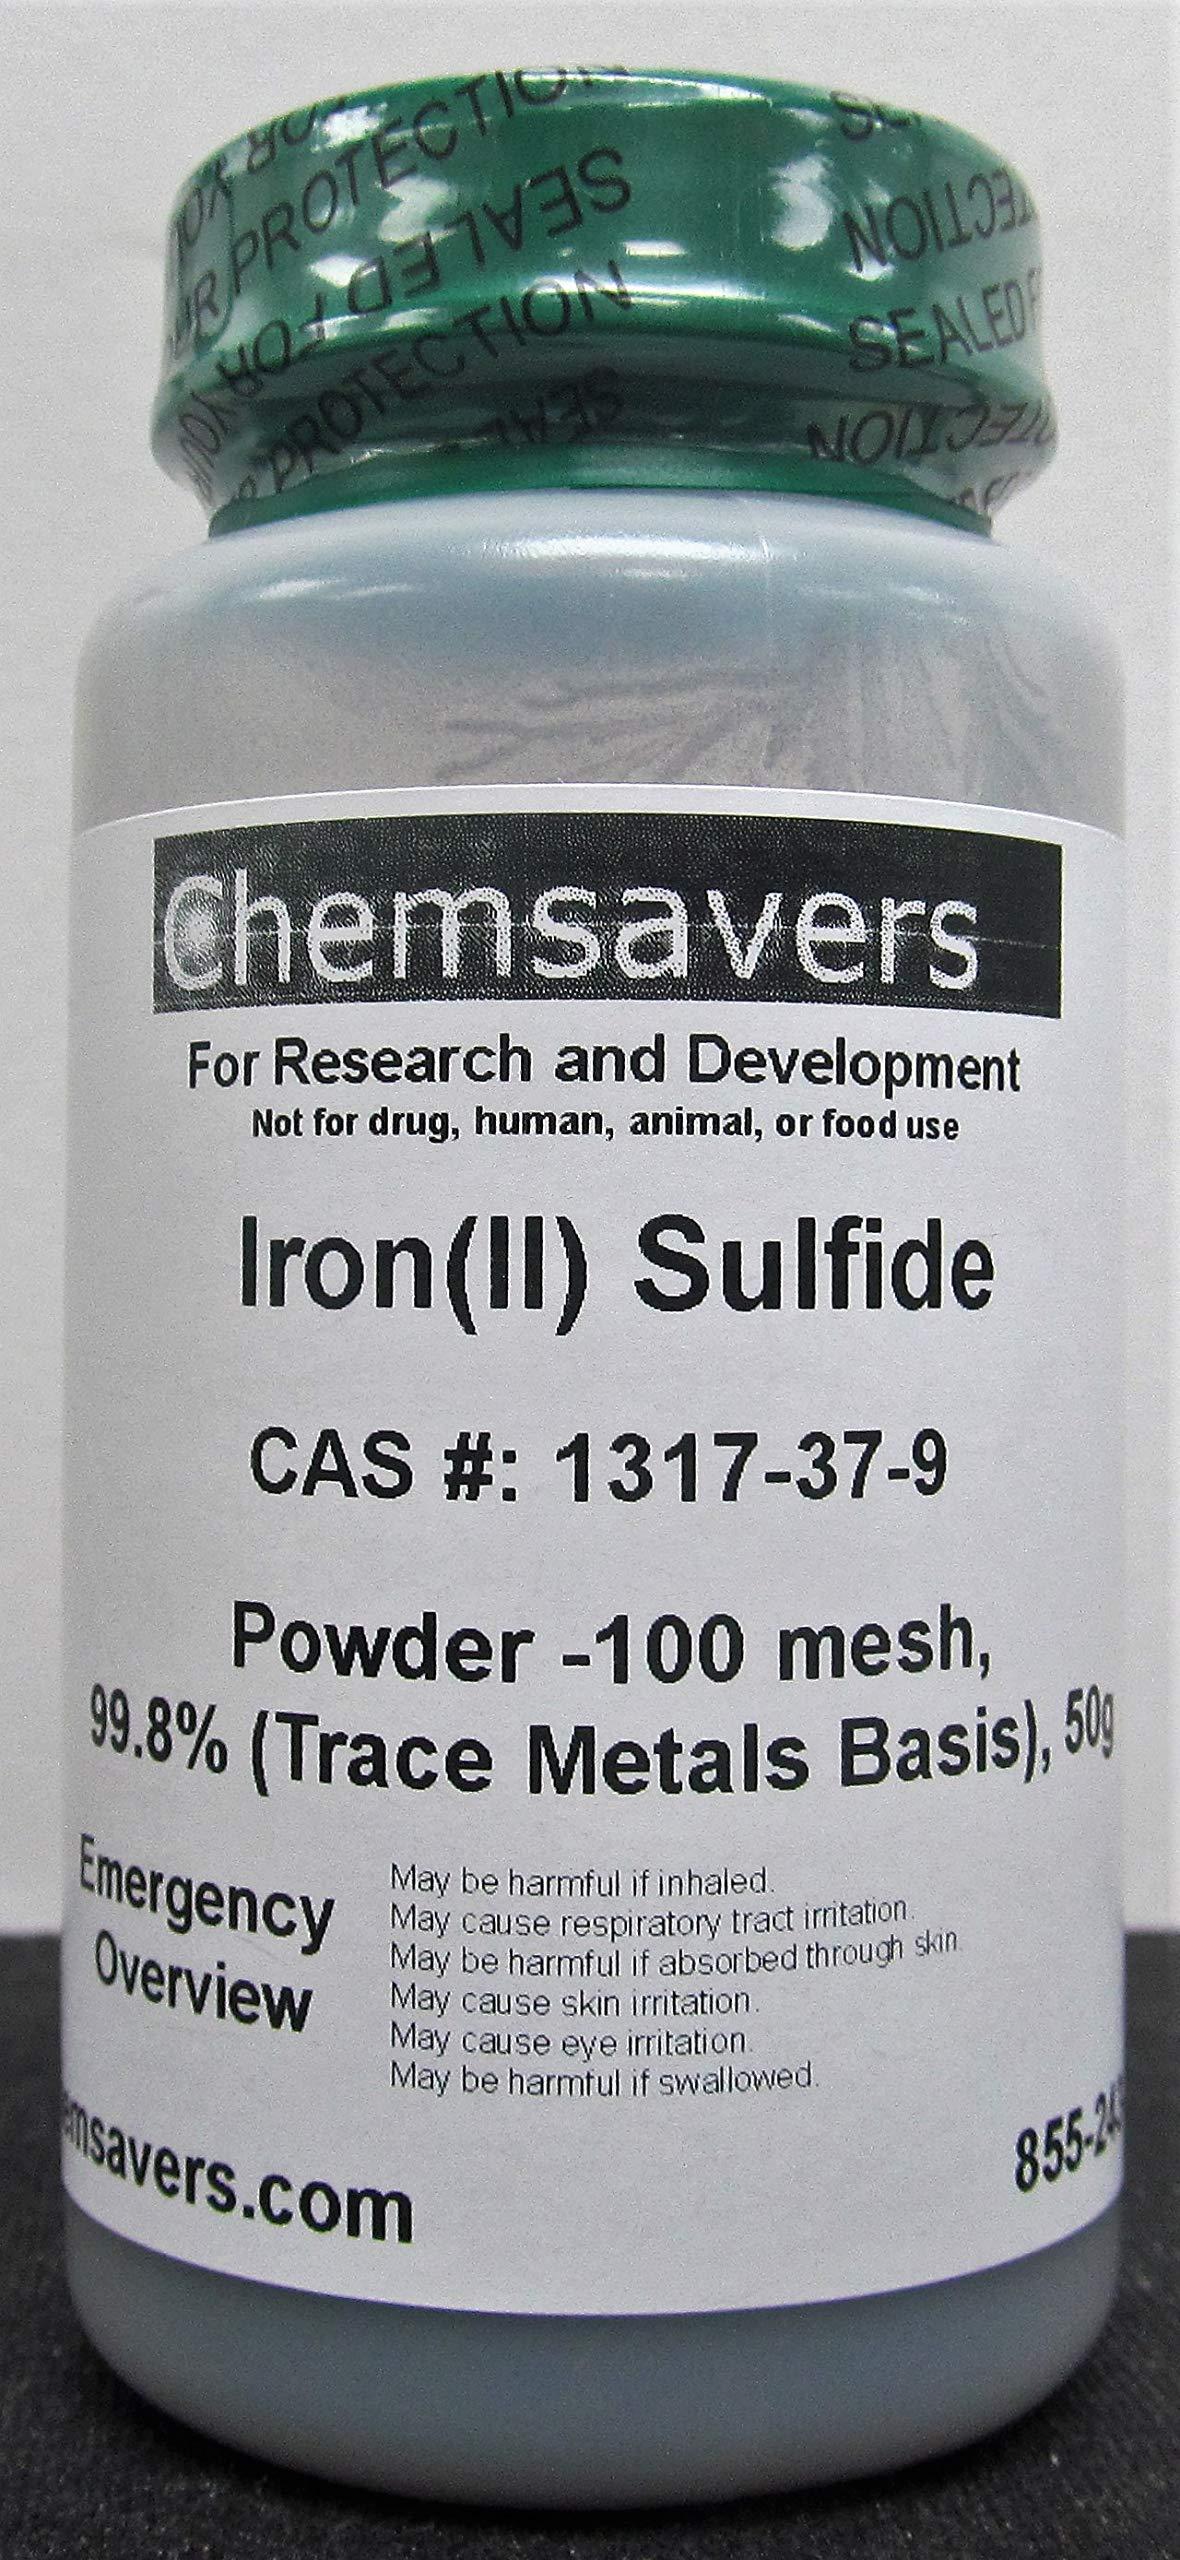 Iron(II) Sulfide, Powder -100 mesh, 99.8% (Trace Metals Basis), 50g